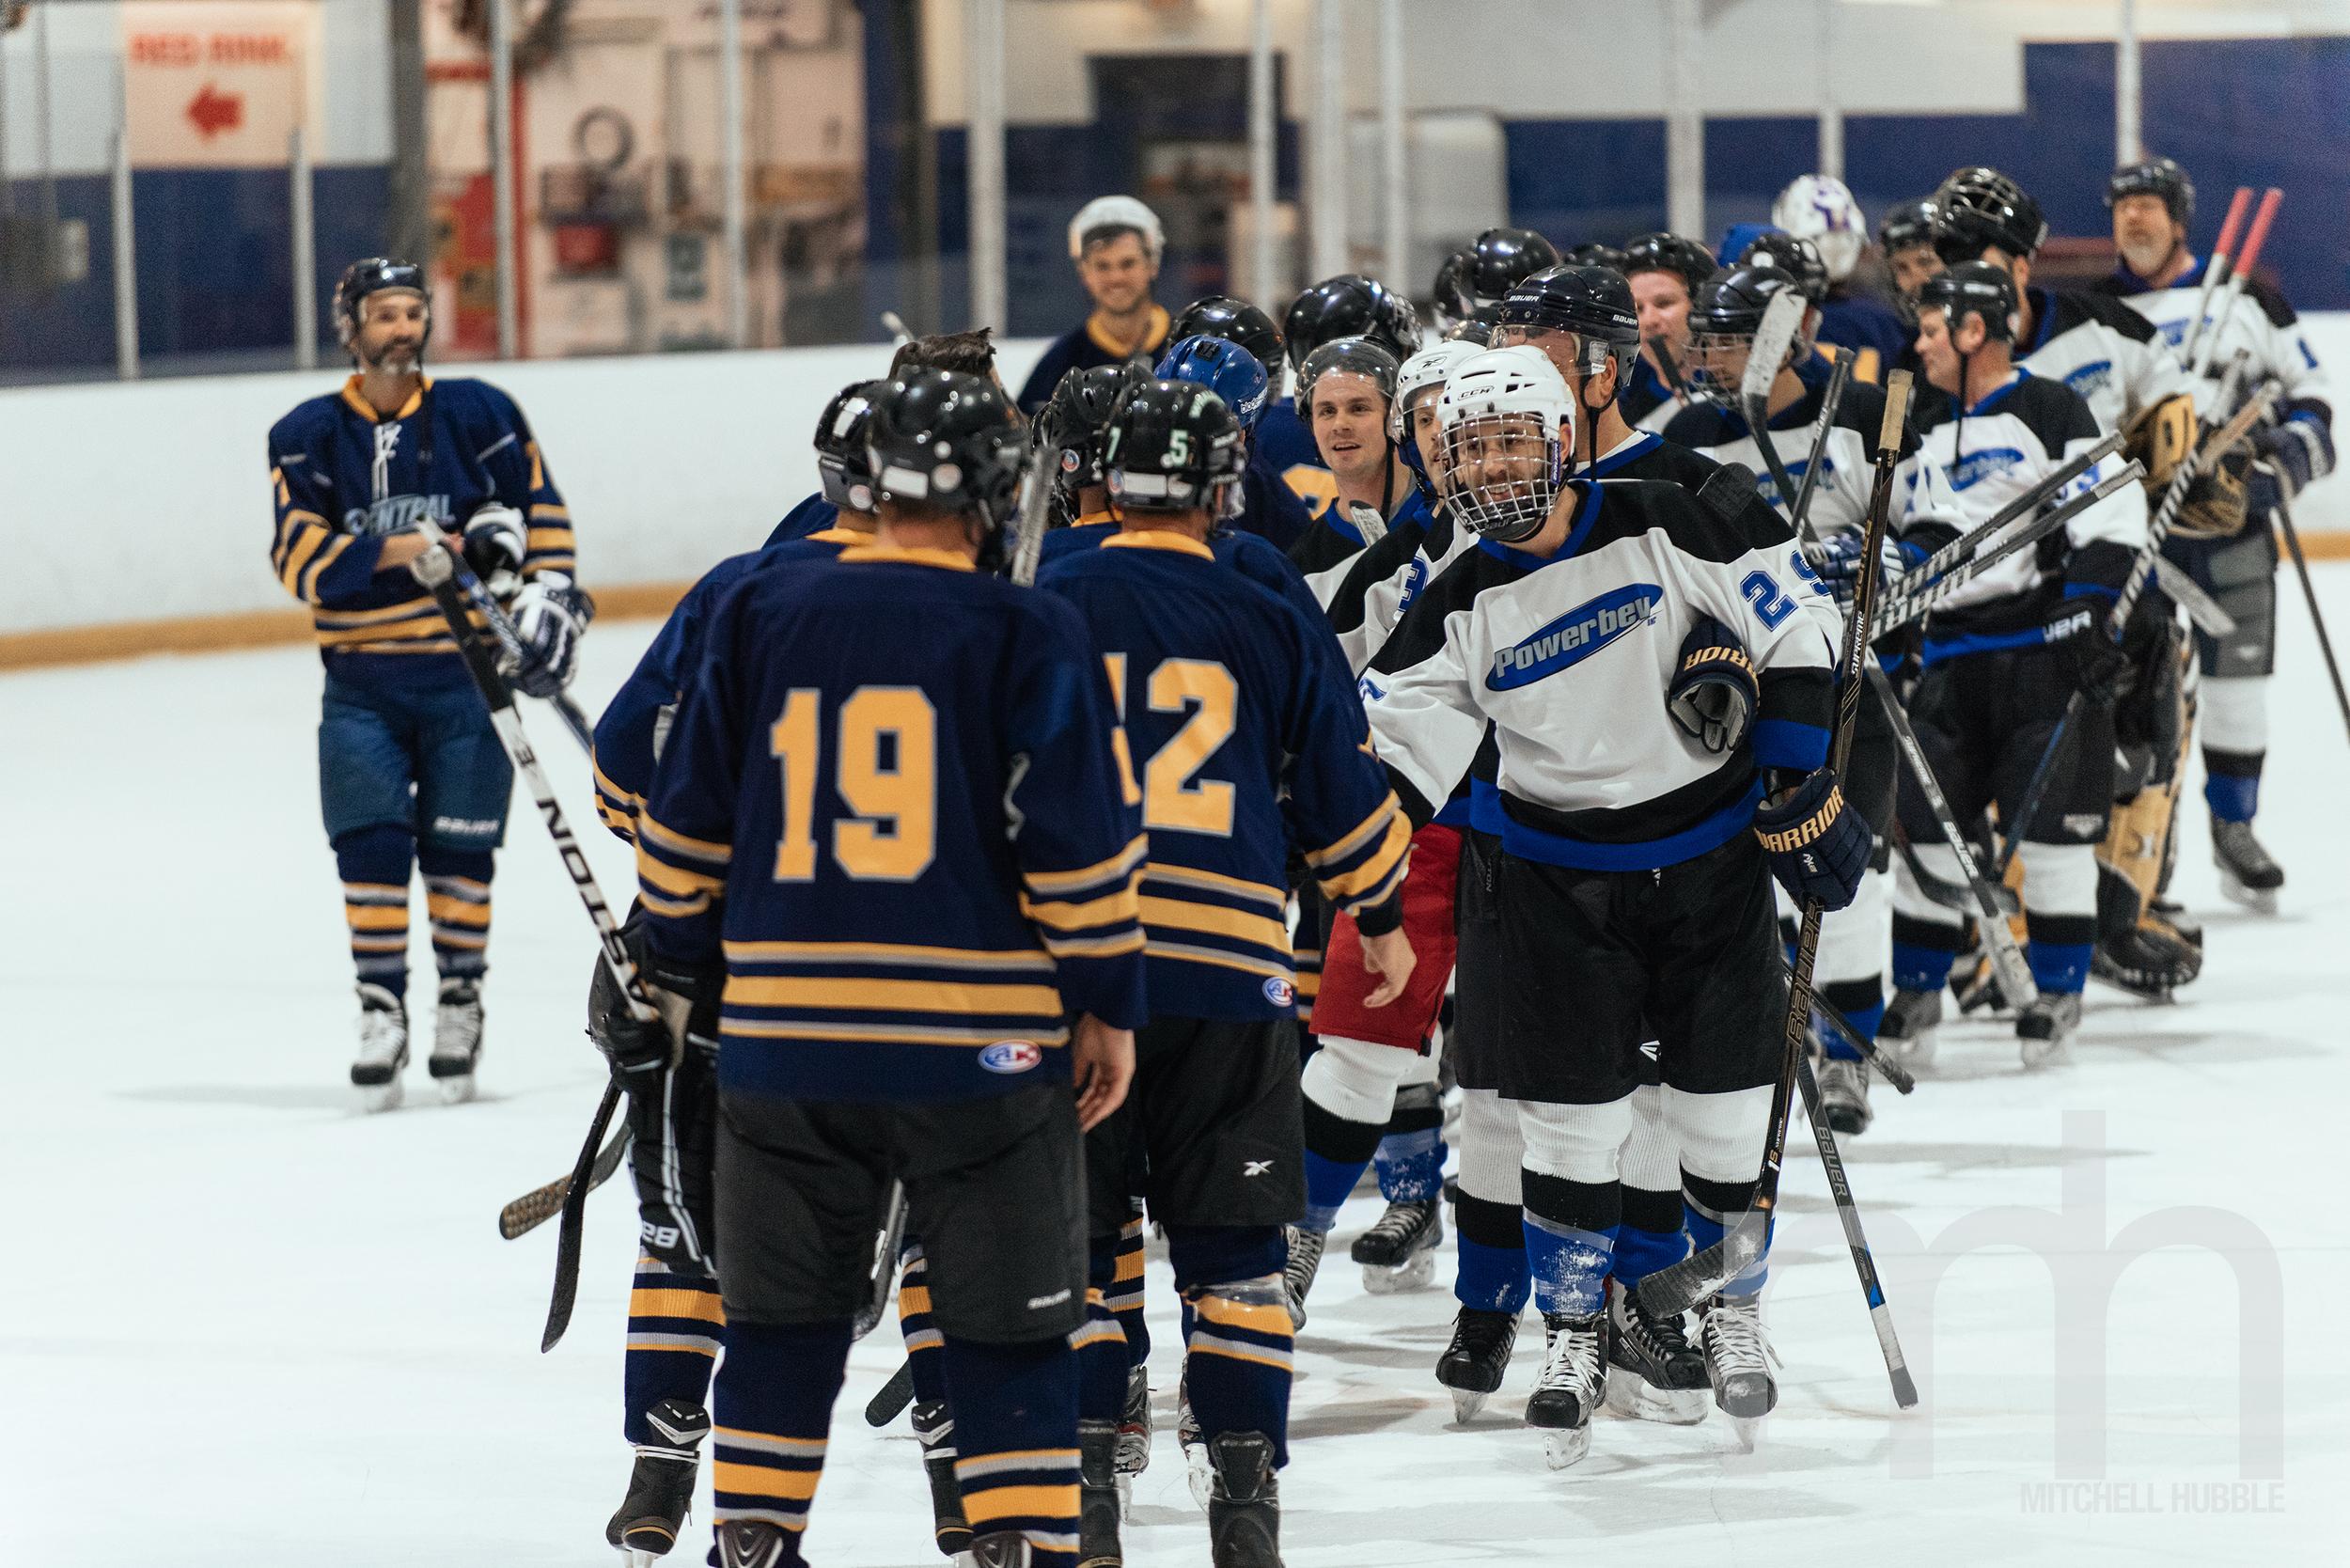 RB_Hockey-65.jpg